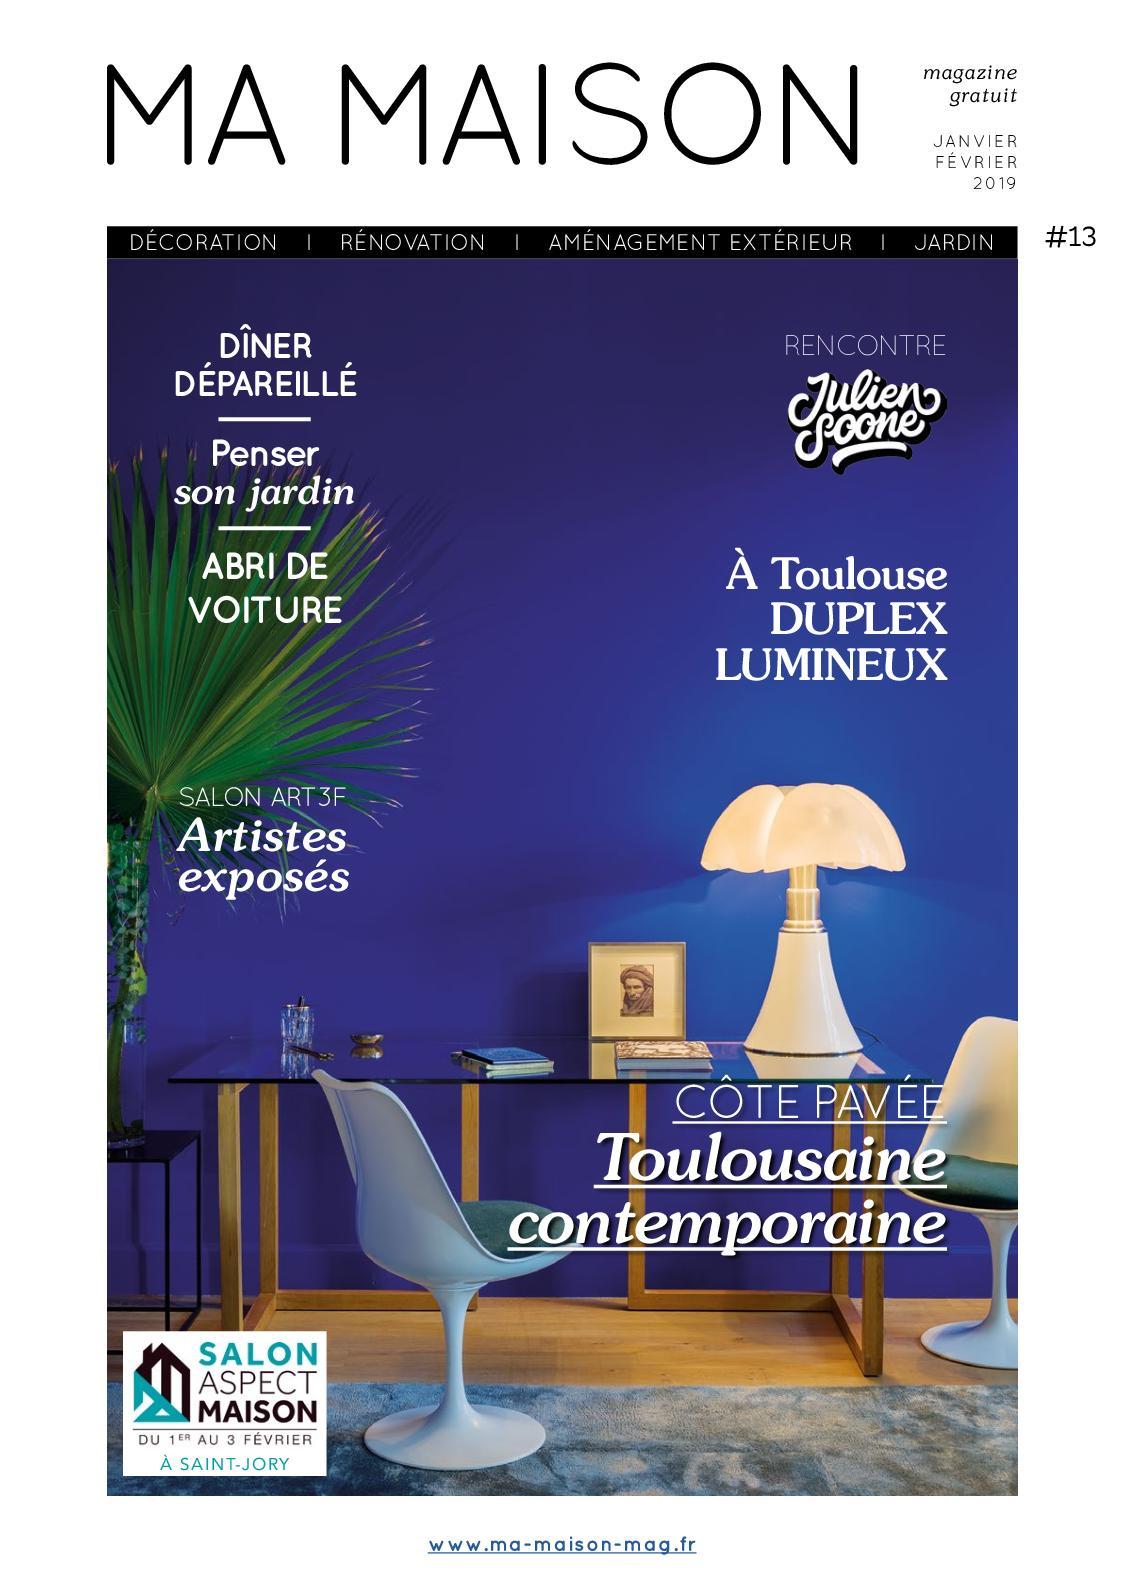 Table Roulante De Jardin Best Of Calaméo Ma Maison Magazine Gratuit Numero 13 Of 39 Génial Table Roulante De Jardin